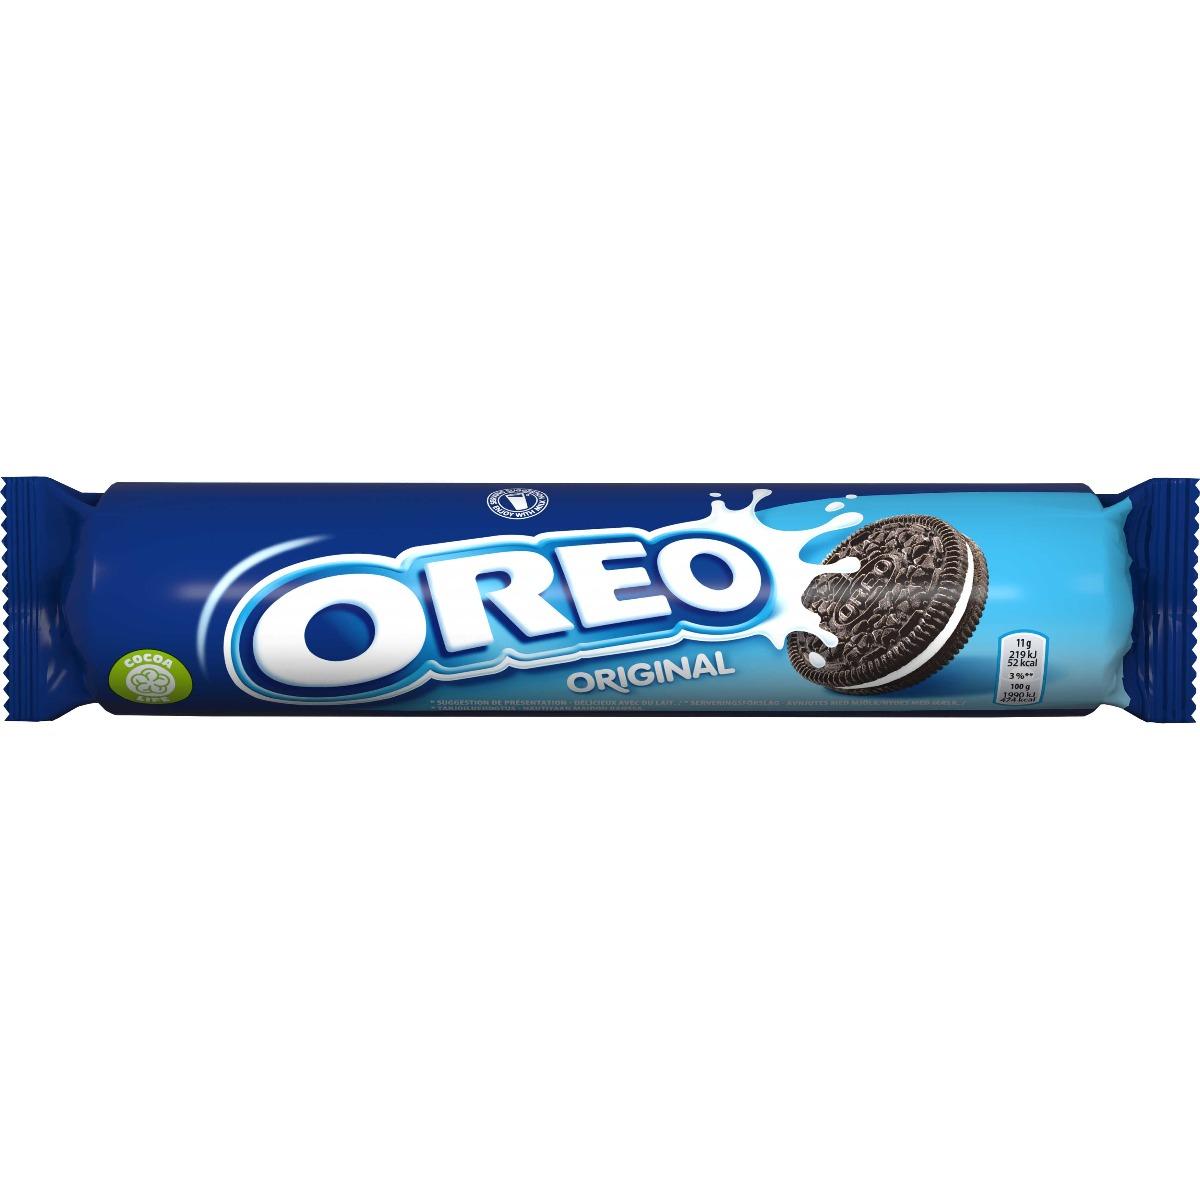 Biscuiti cu crema de vanilie Oreo Original, 154 g imagine